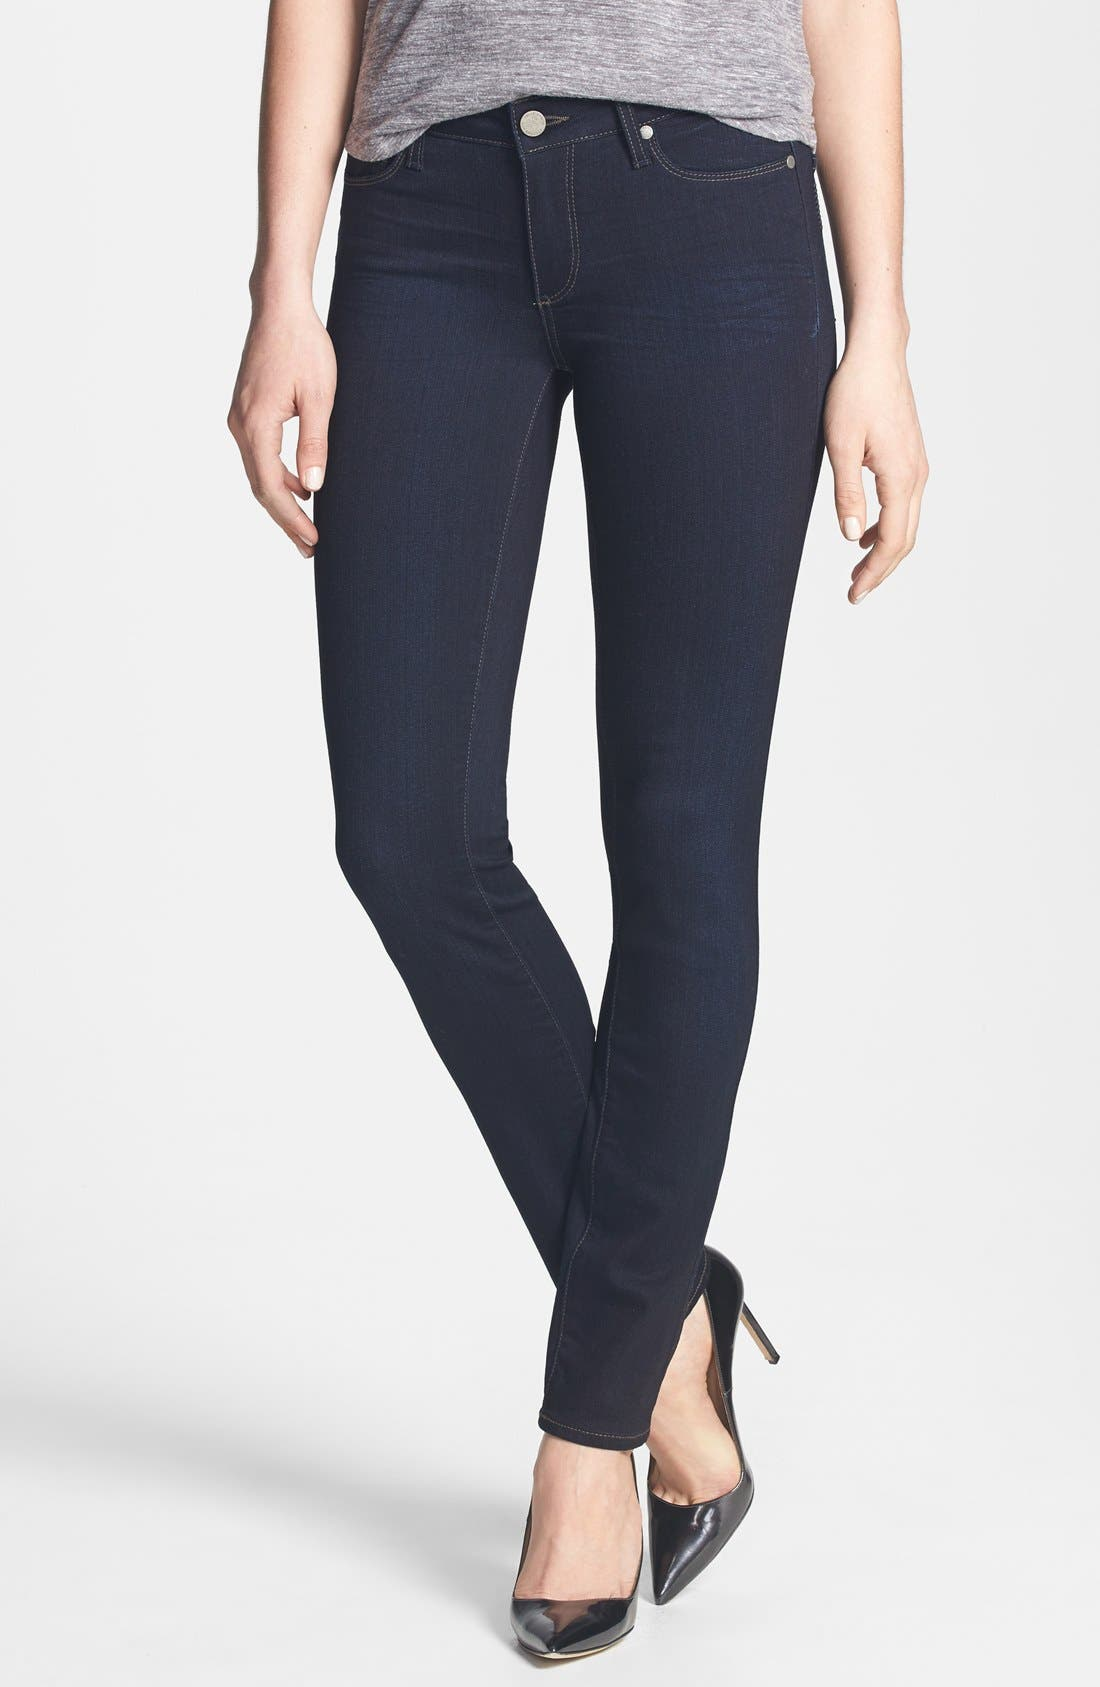 Alternate Image 1 Selected - PAIGE 'Transcend - Skyline' Skinny Jeans (Mona)